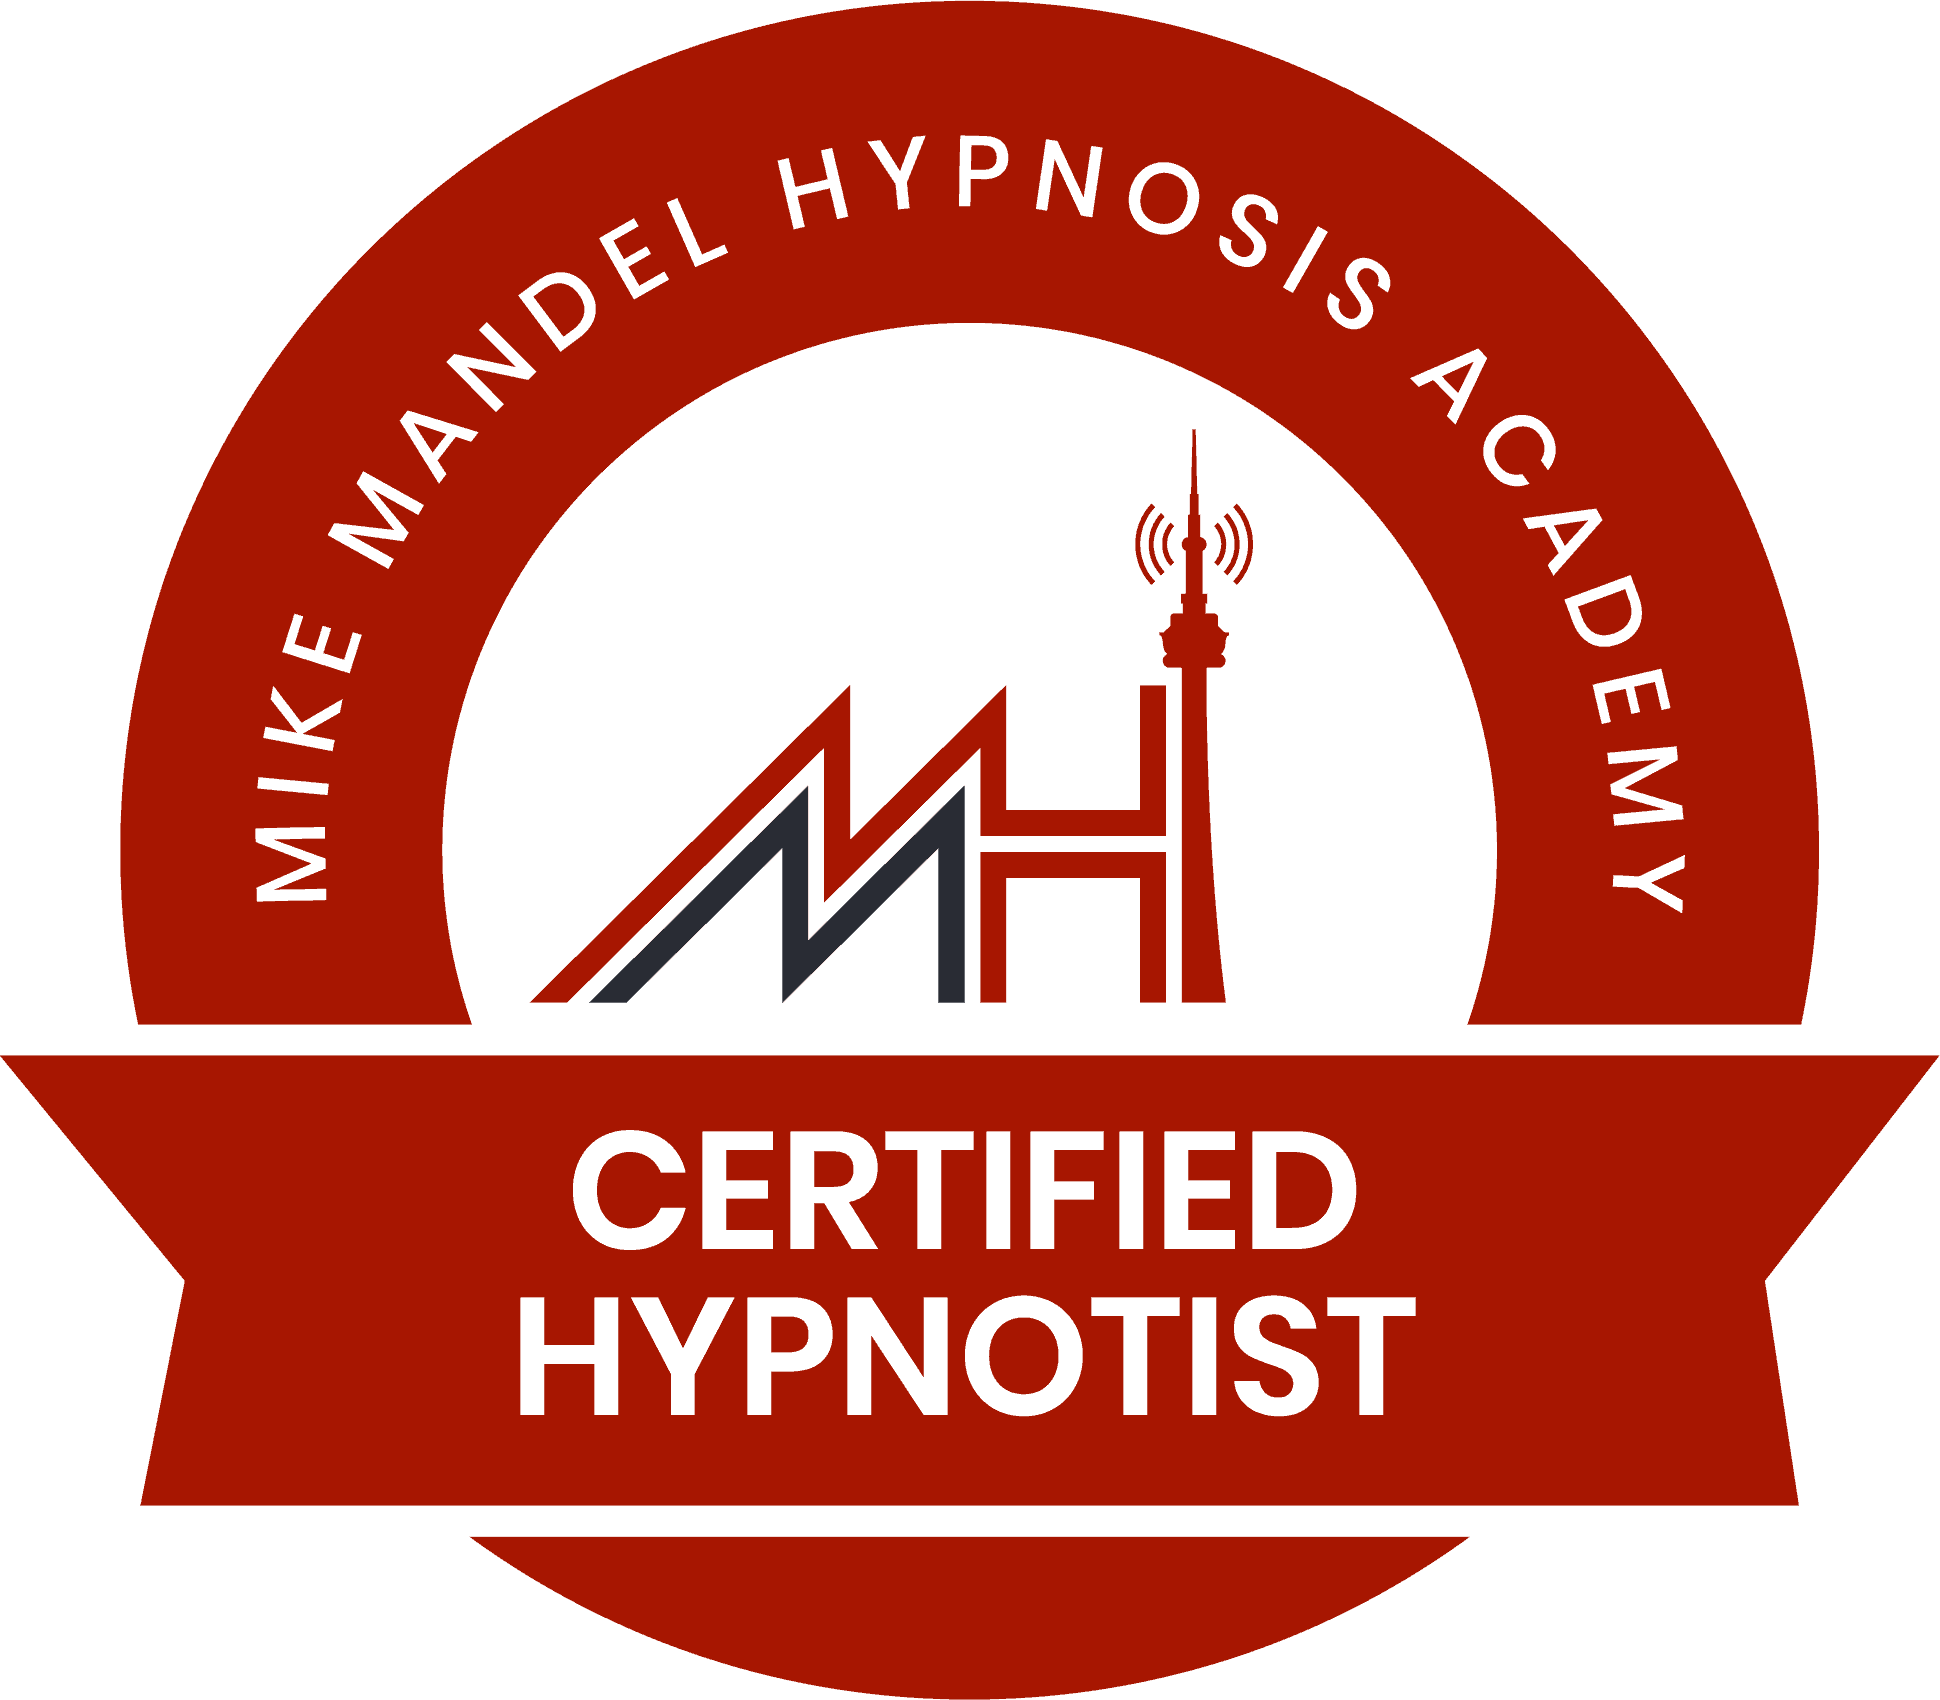 Mike Mandel Hypnosis Academy Certified Hypnotist